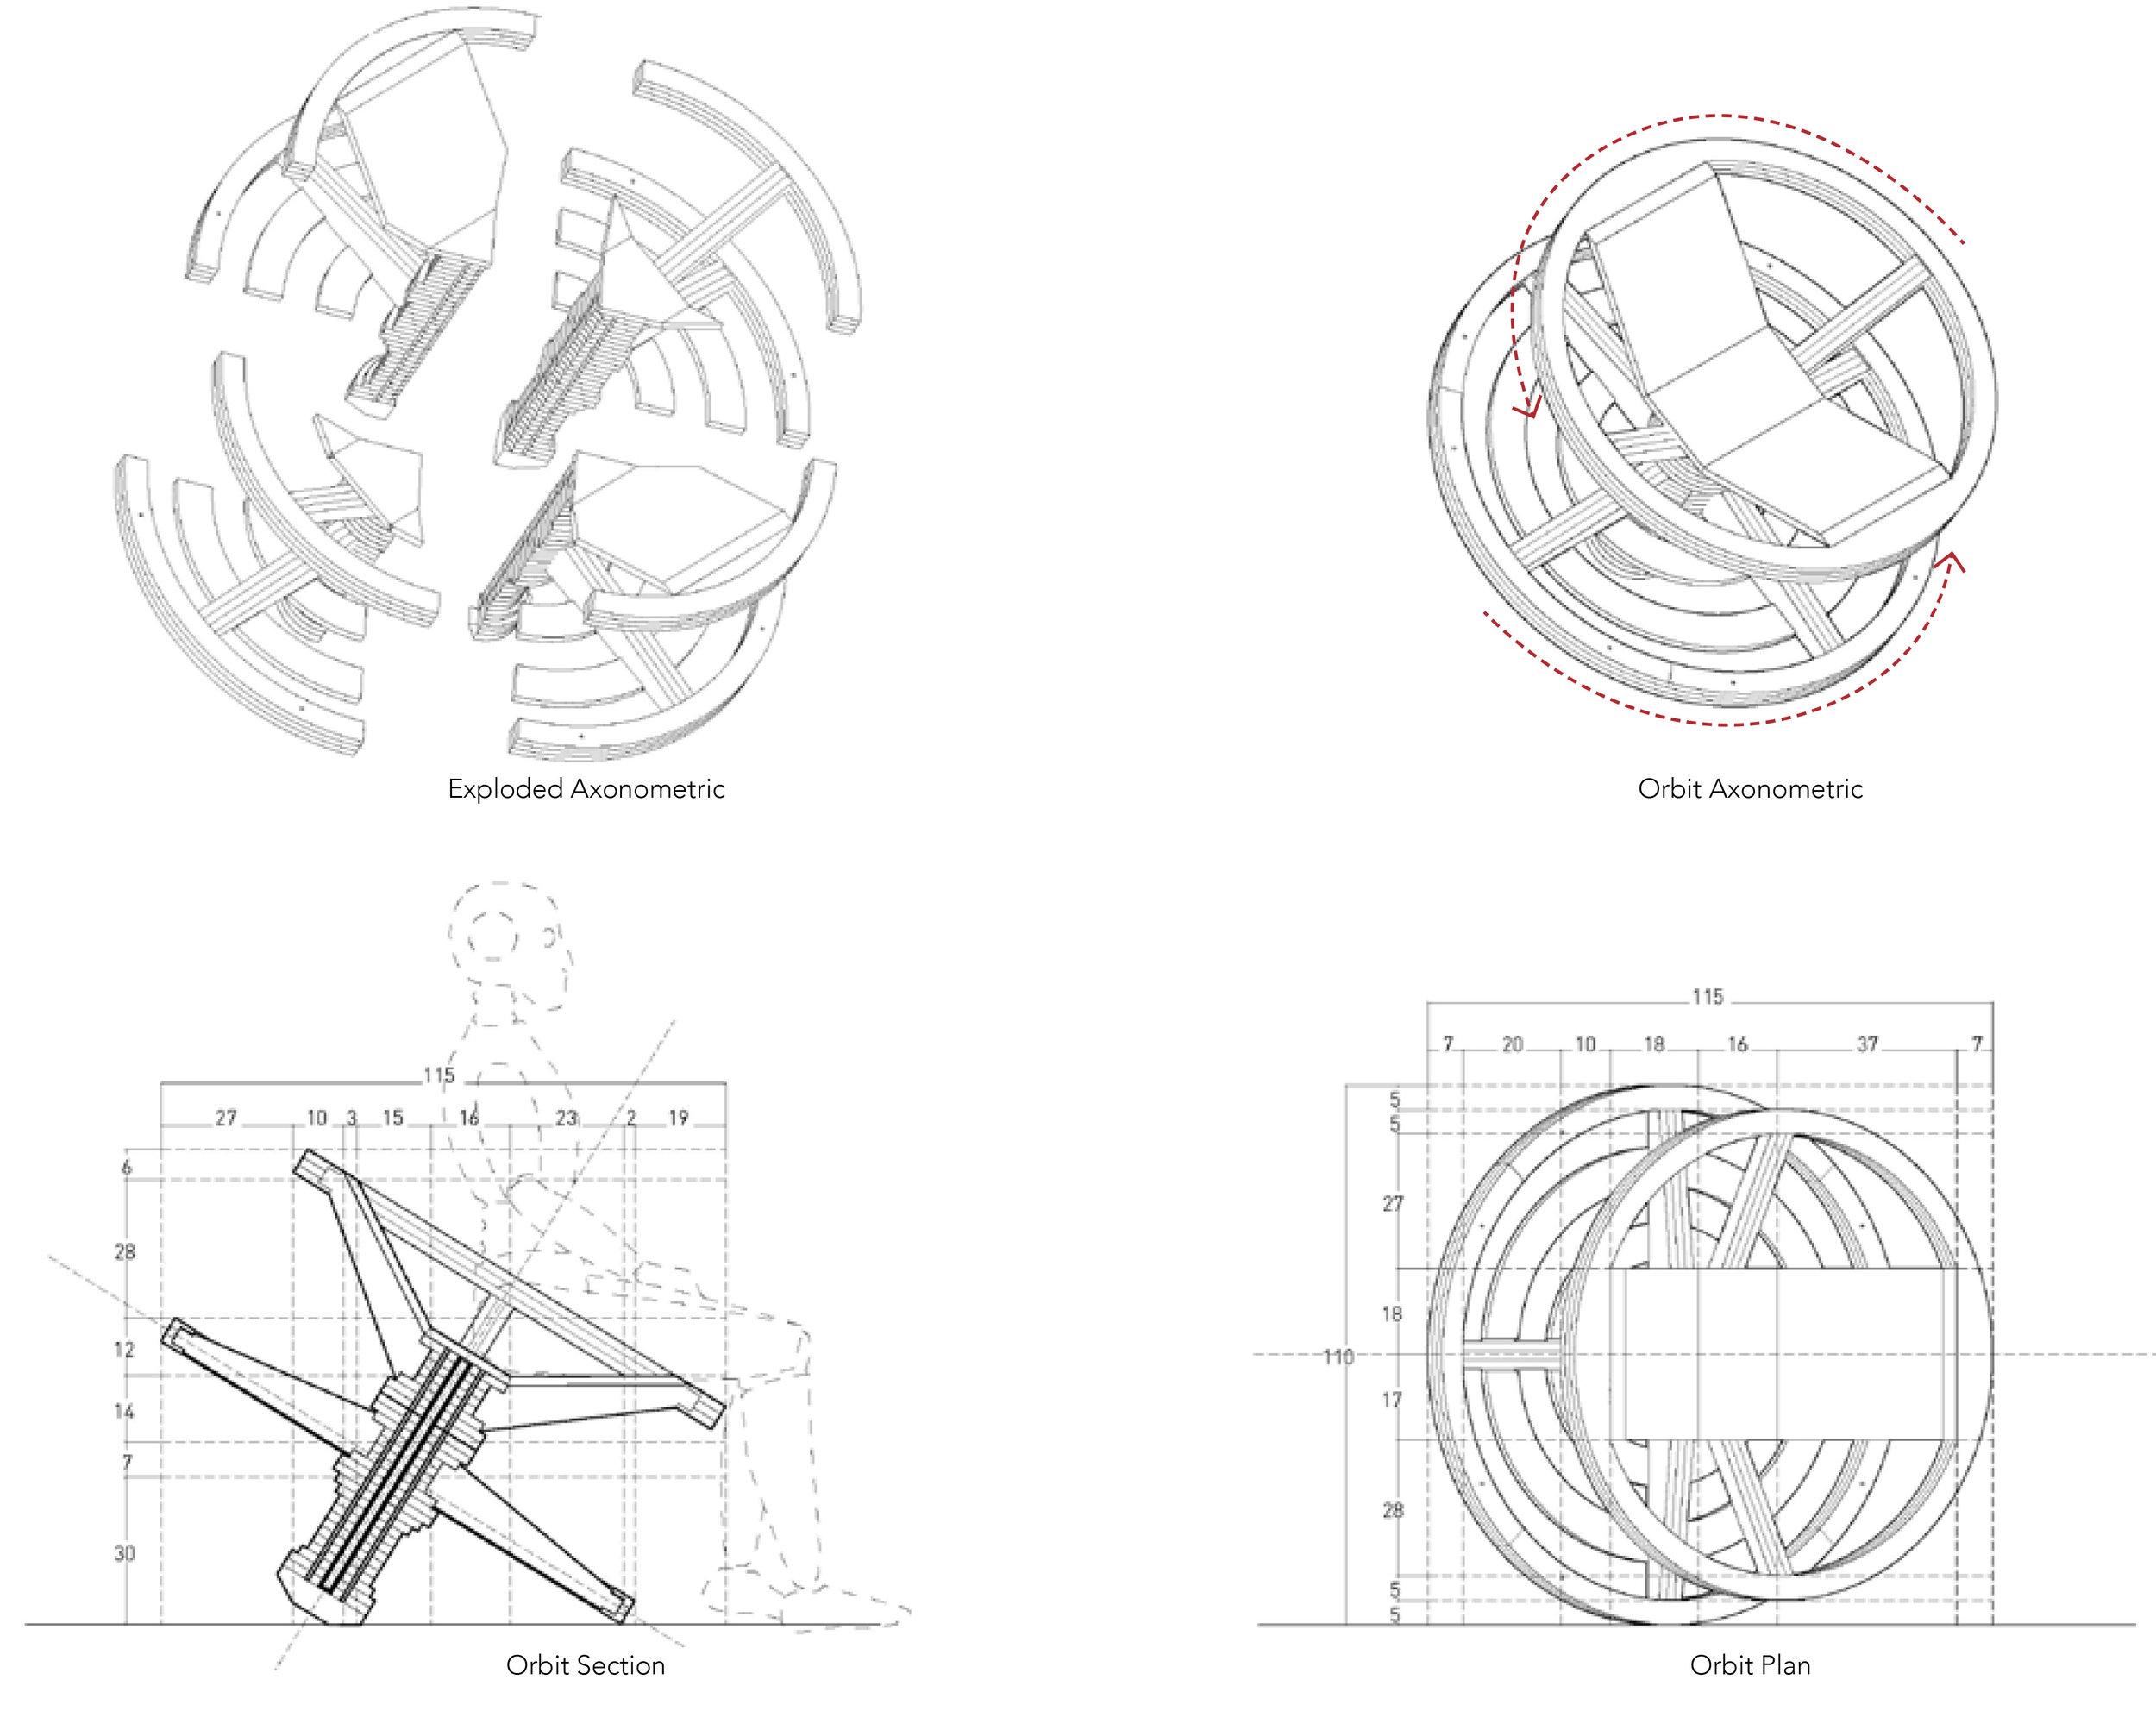 Orbit Mode Drawings